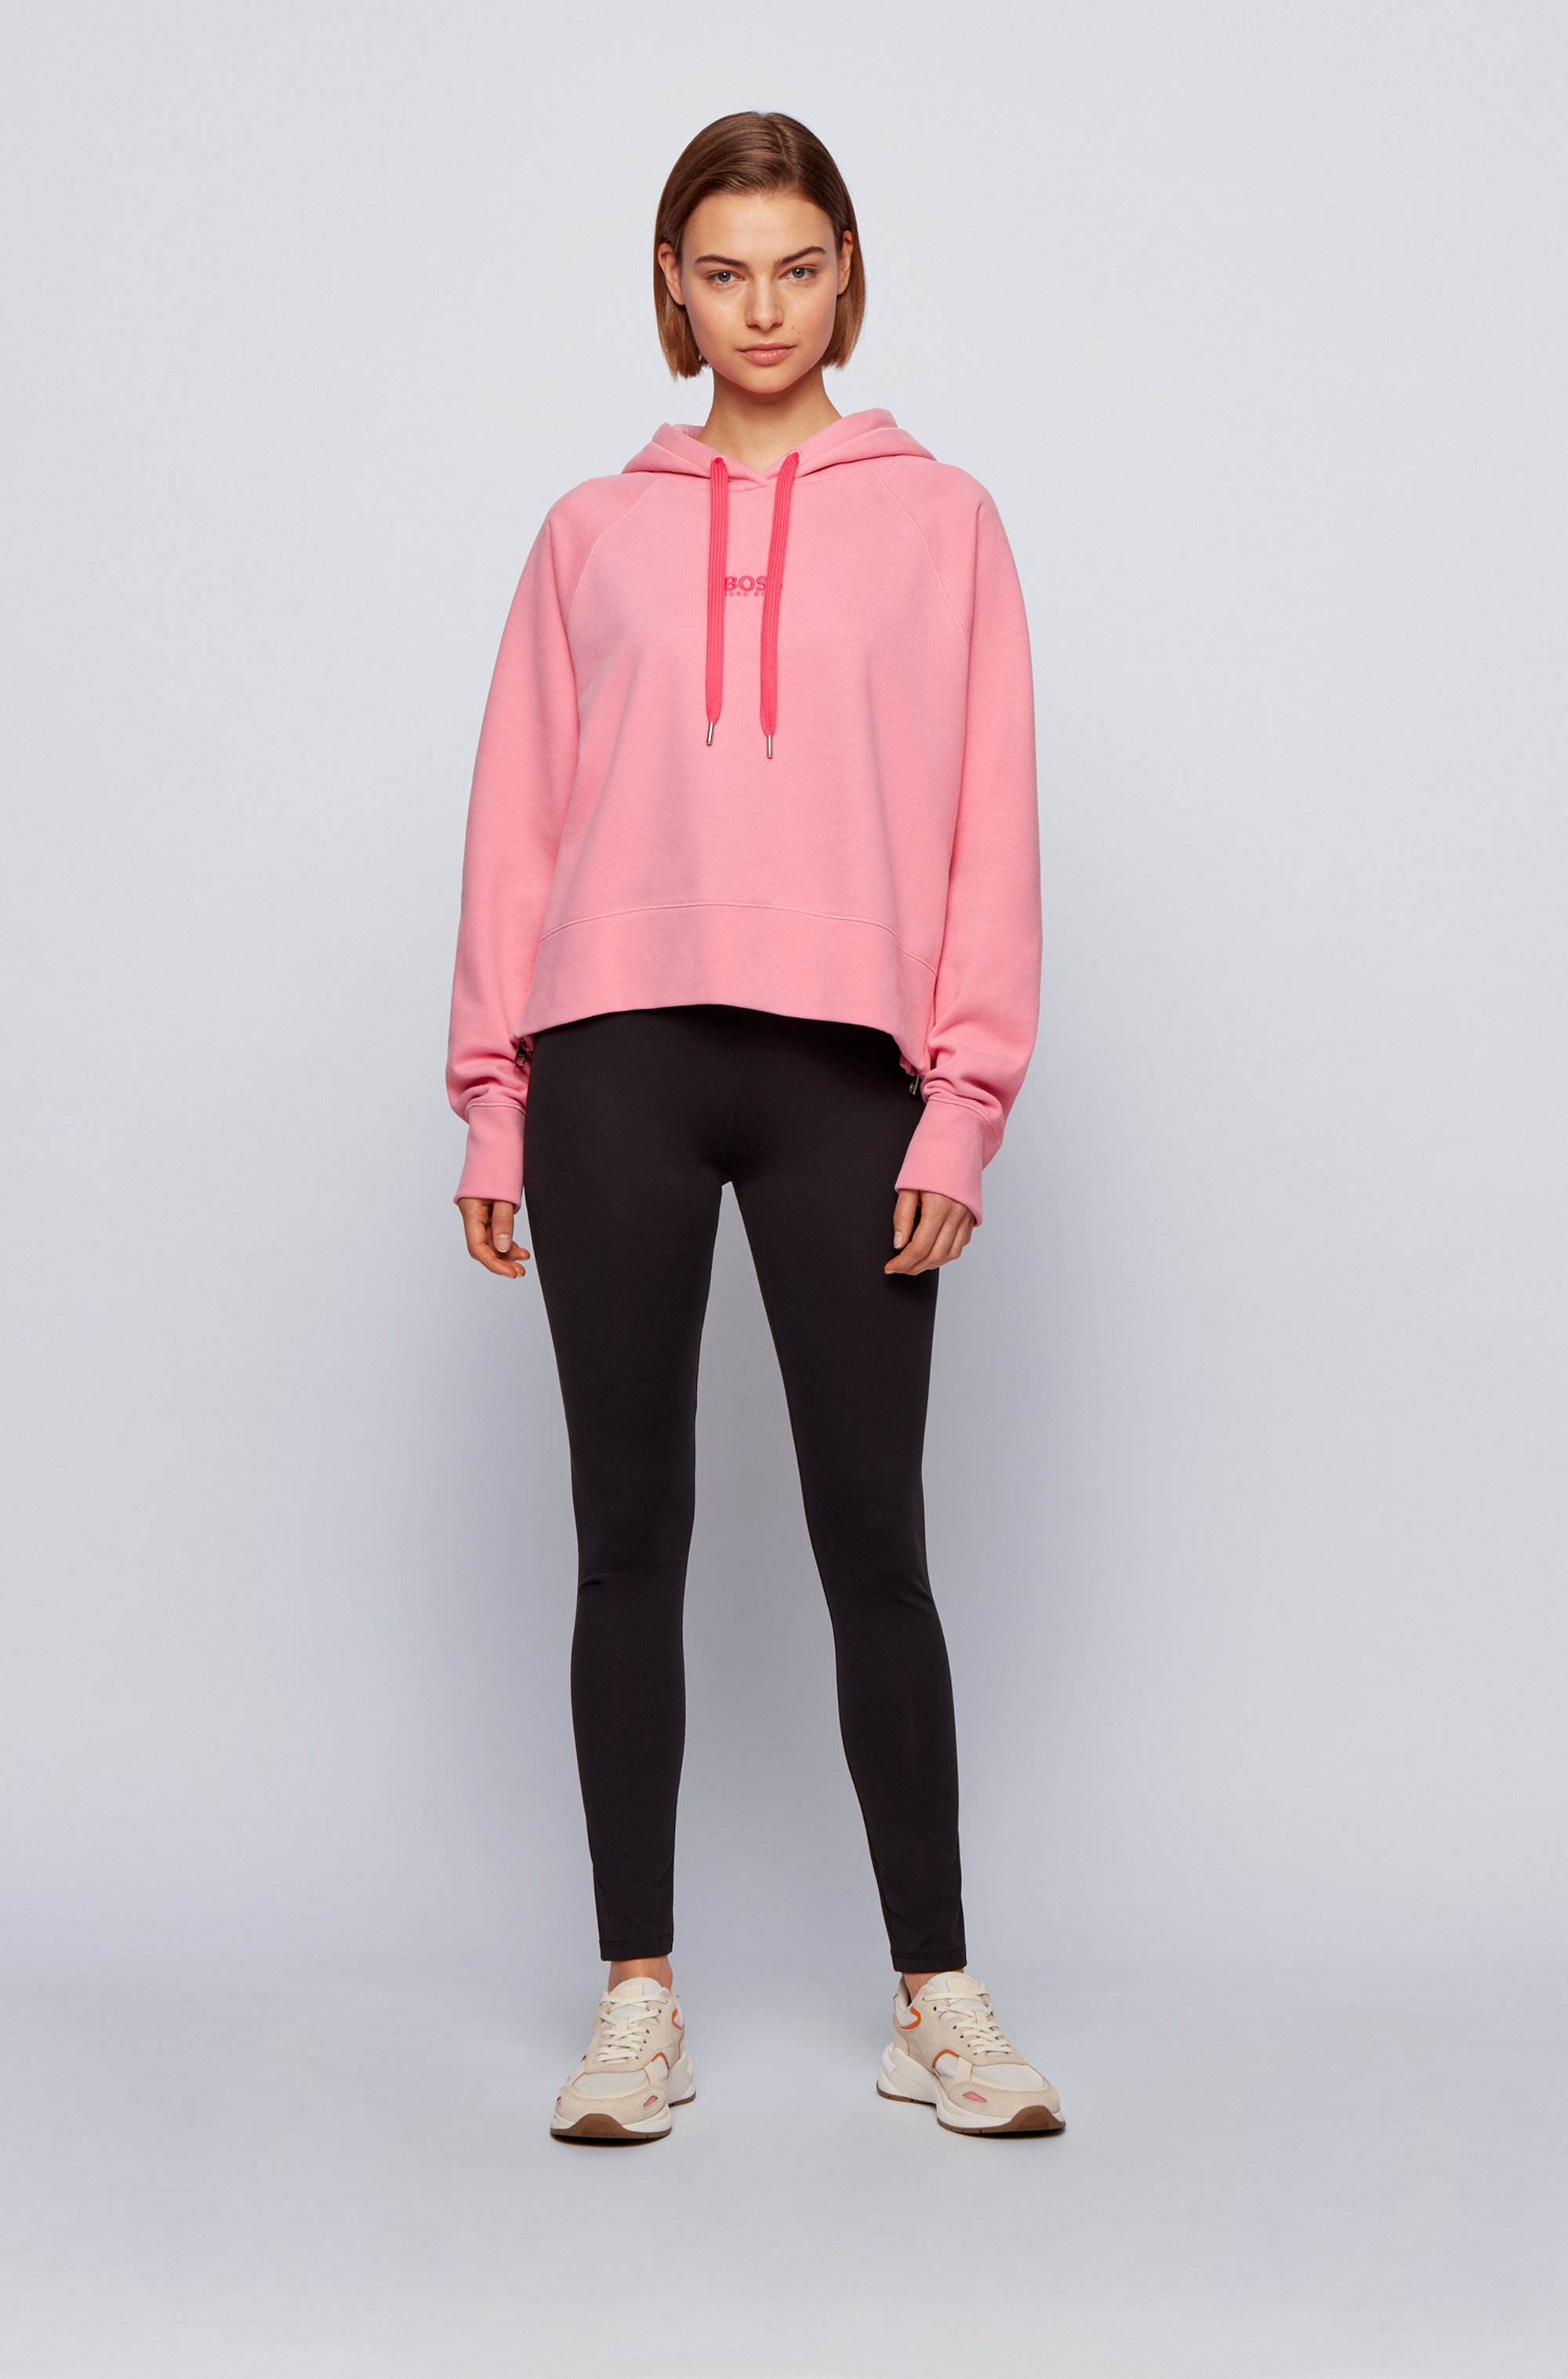 Legging Super Skinny Fit à taille color block